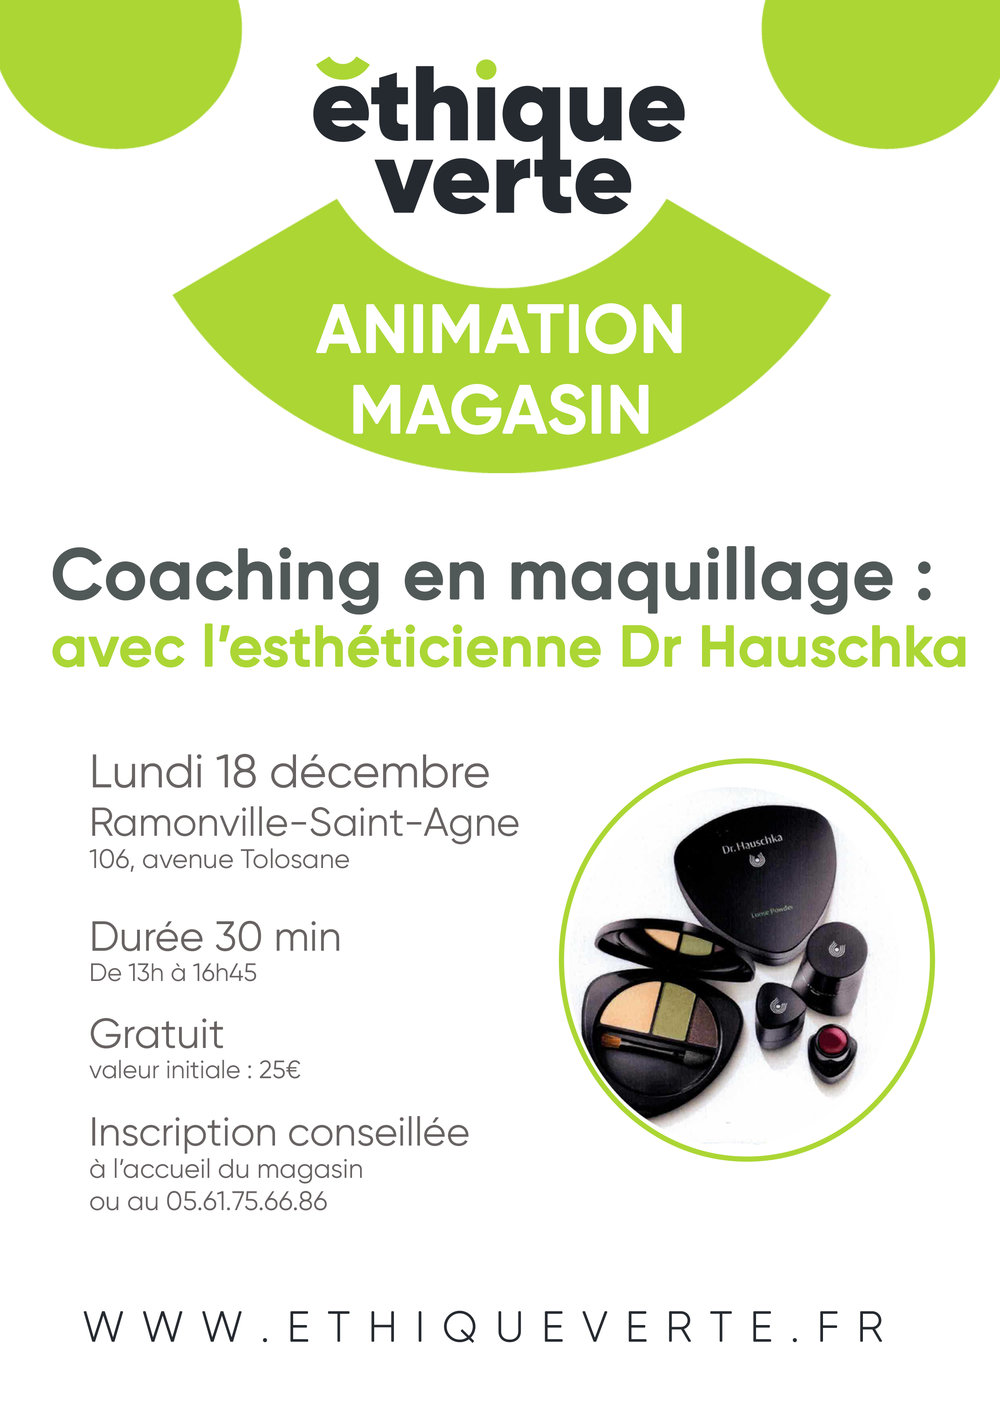 Affiche-animation-cours-maquillage-ethique-verte.jpg